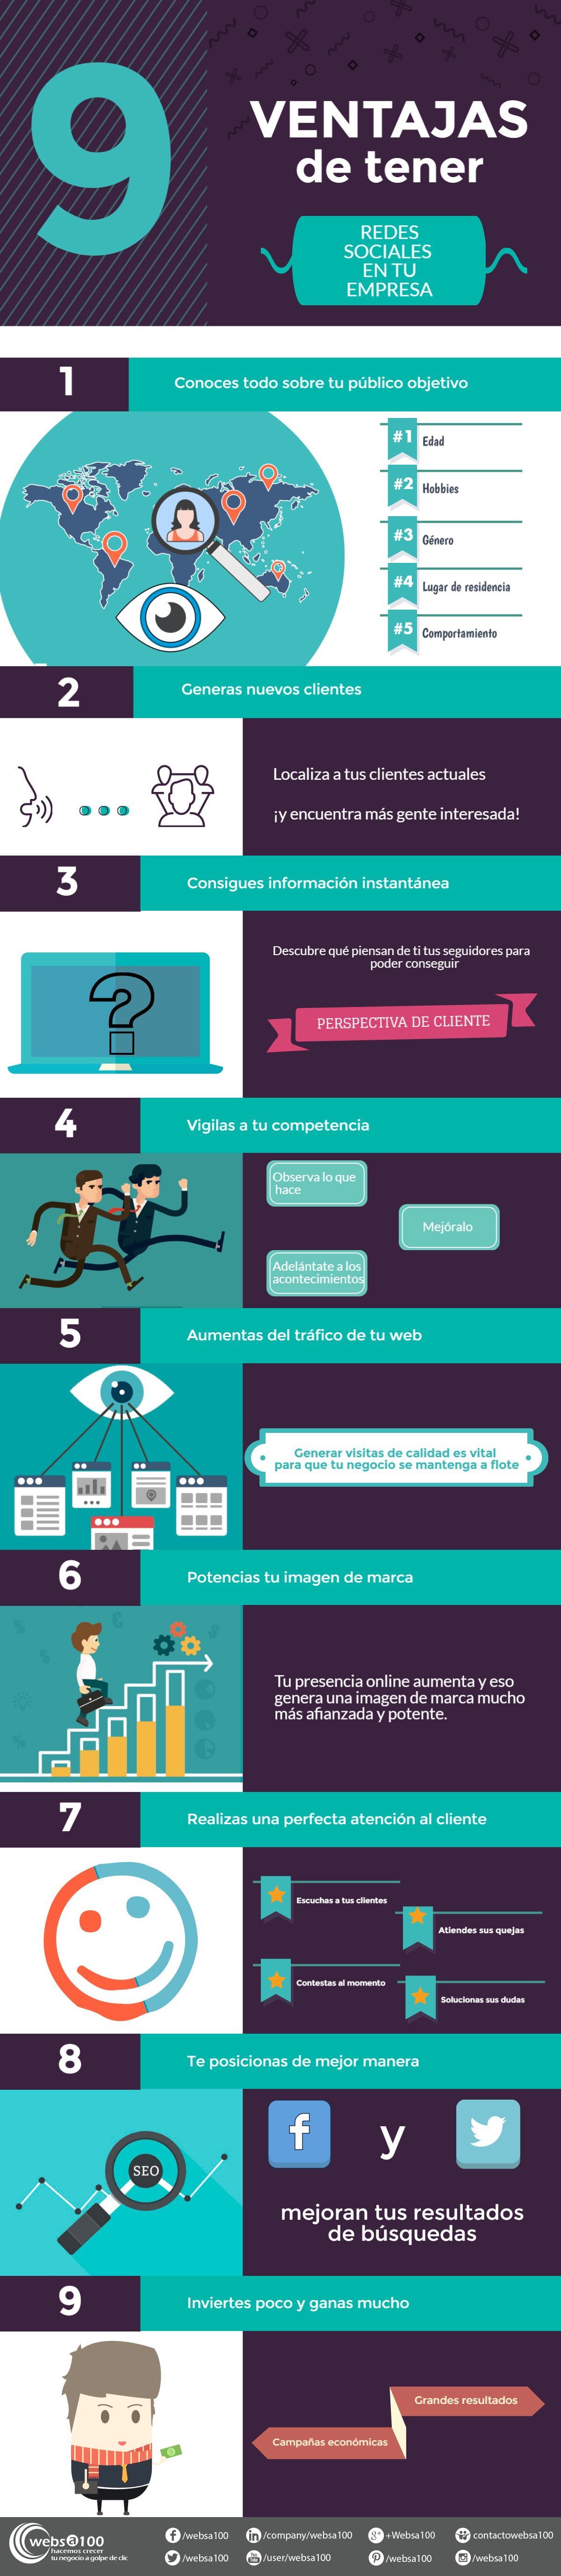 Infografía redes sociales para empresas